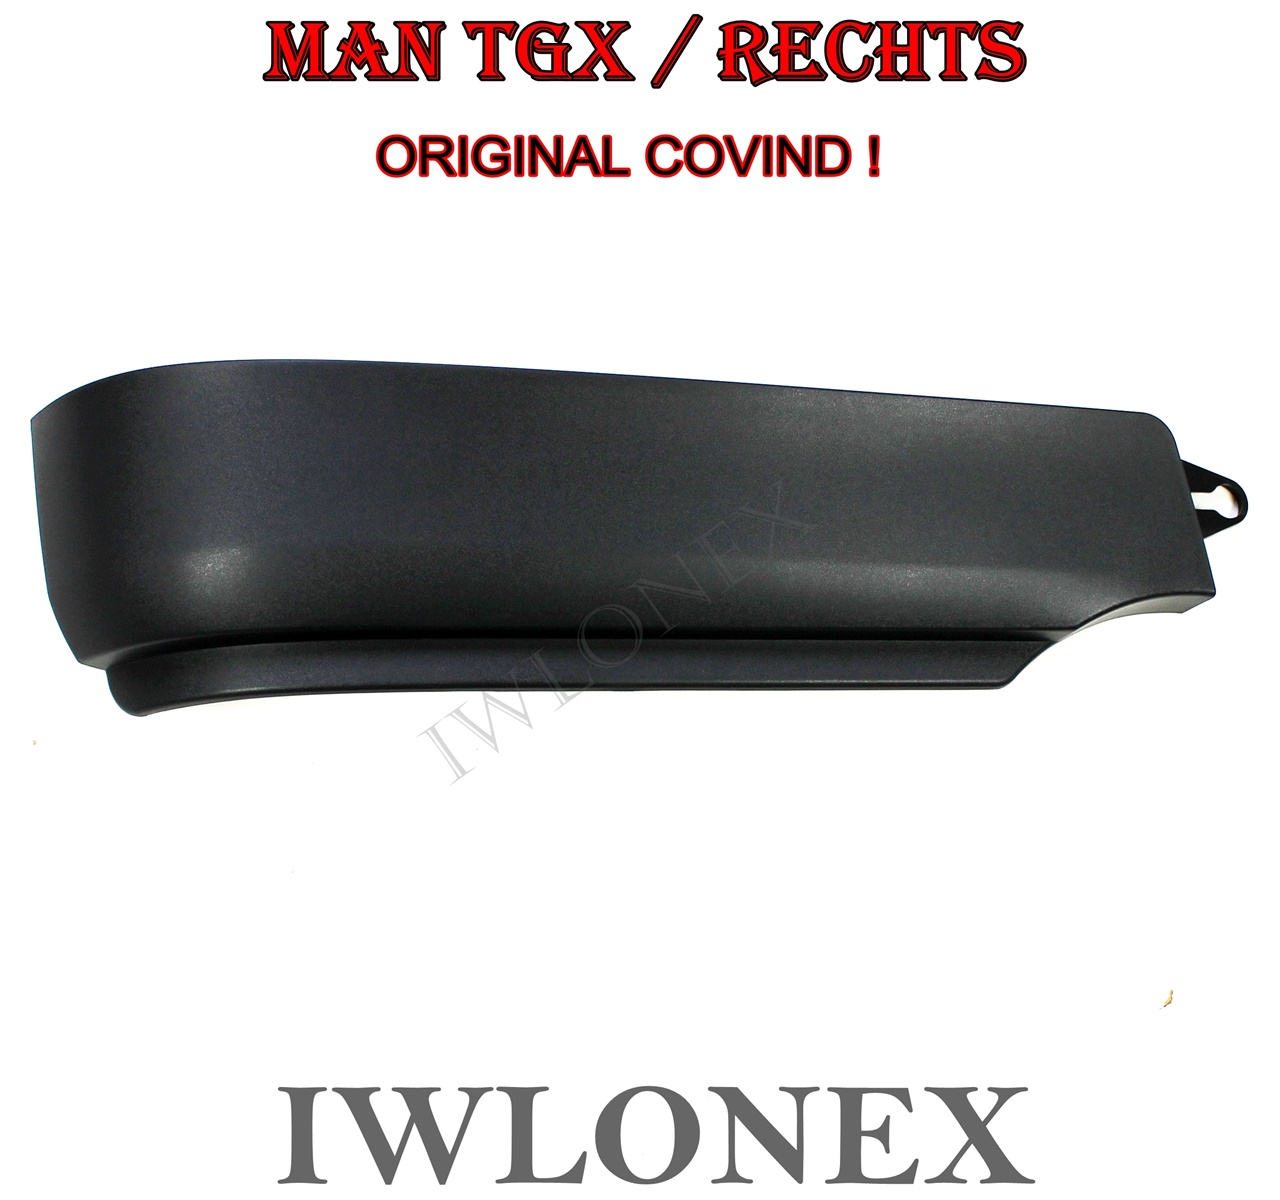 IMG 5330 - Stoßstangenecke, passend für MAN TGX E5 - Rechts